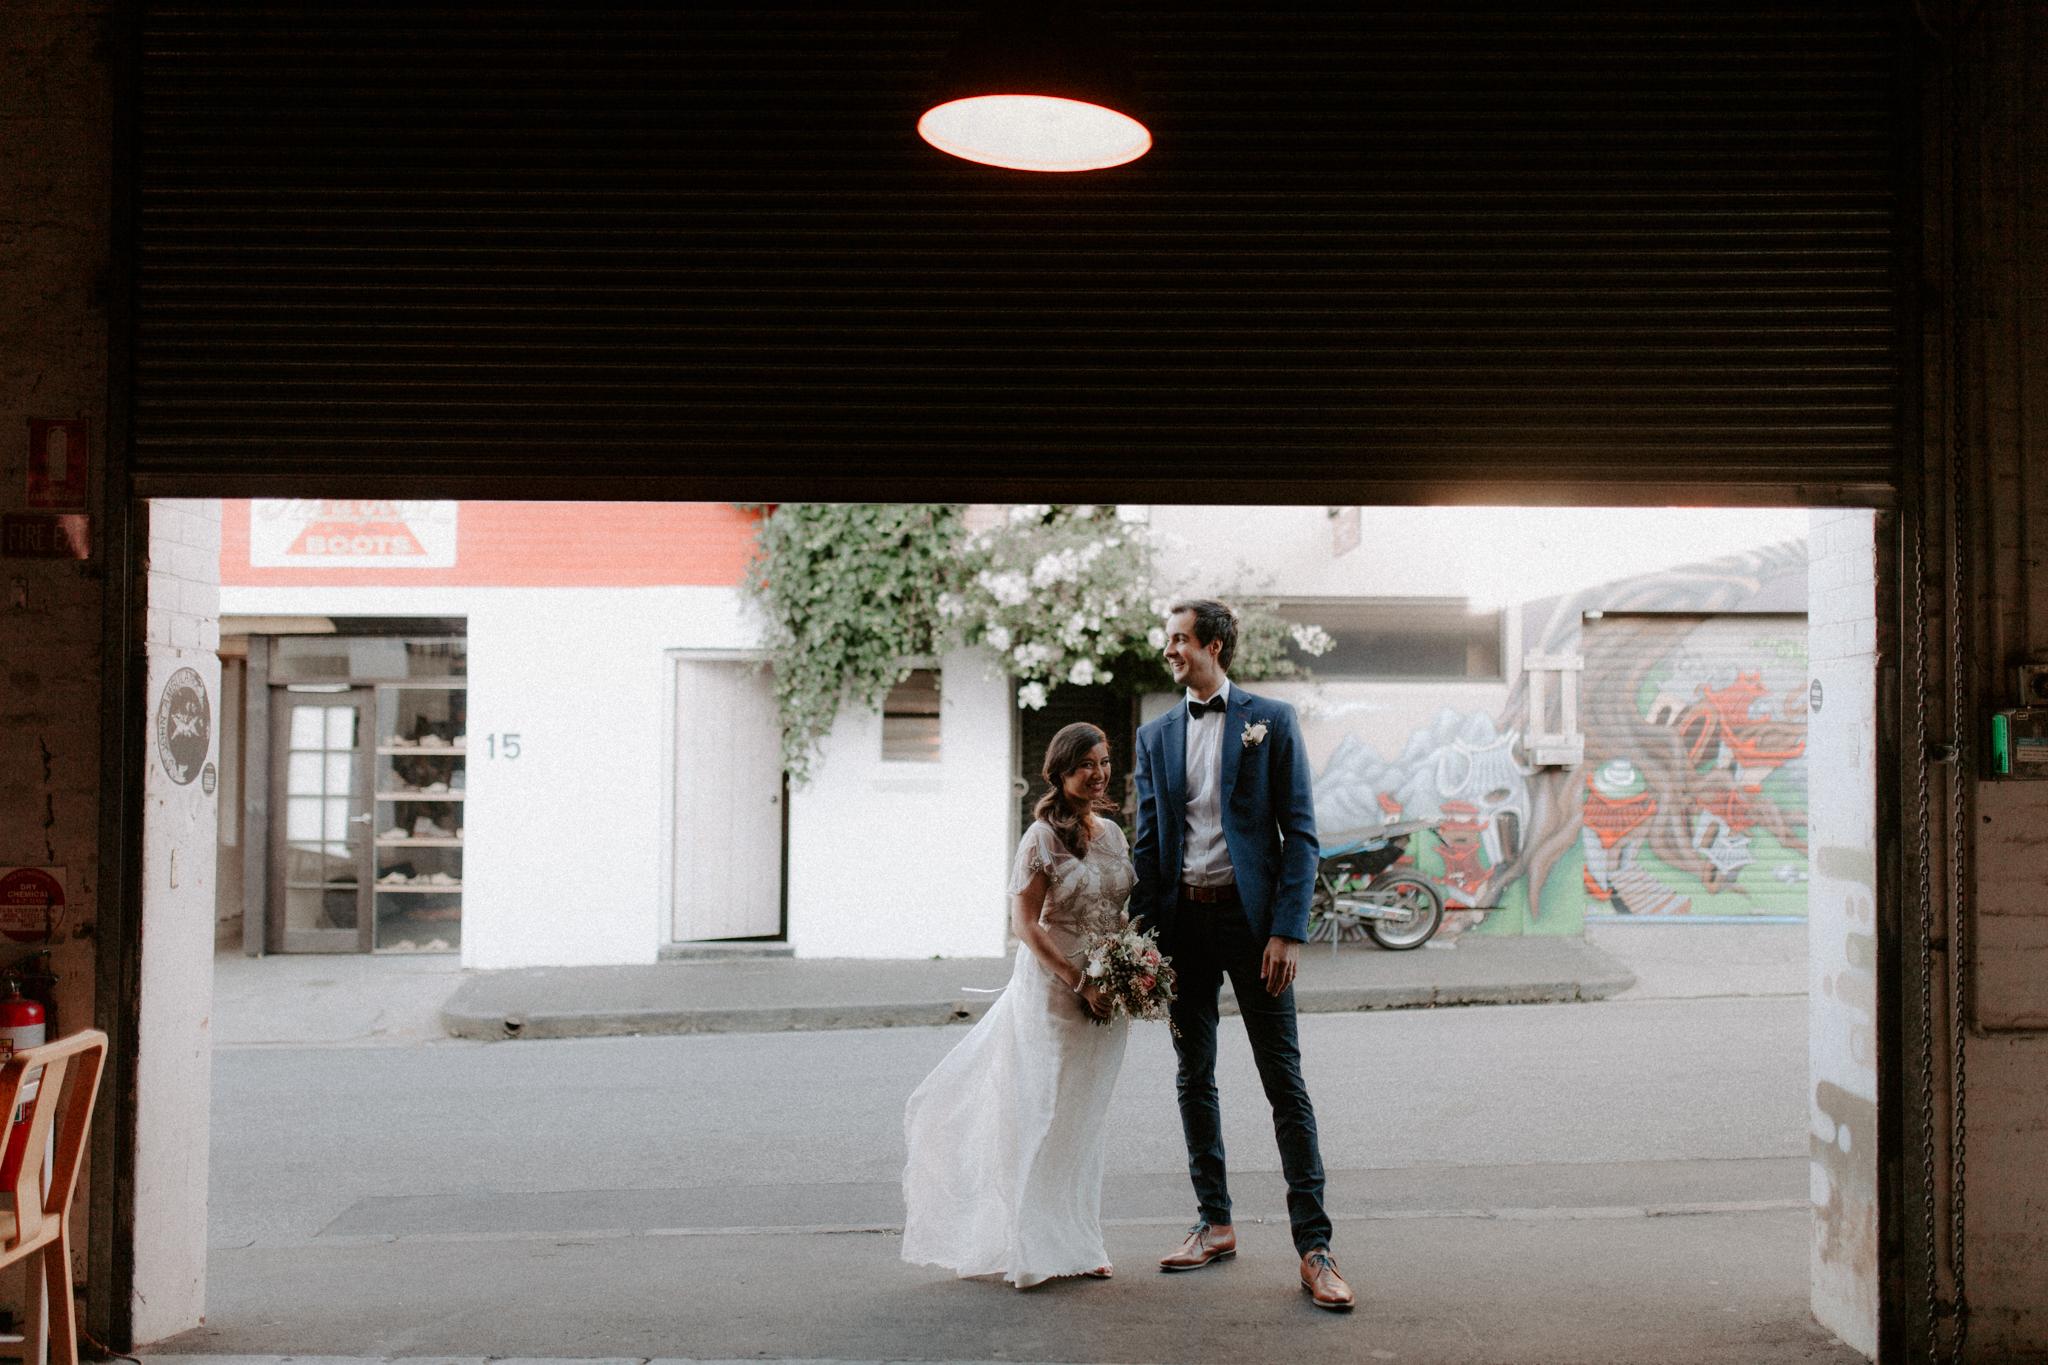 St-Ali-Wedding-Emotions-and-Math-Photography-049.jpg